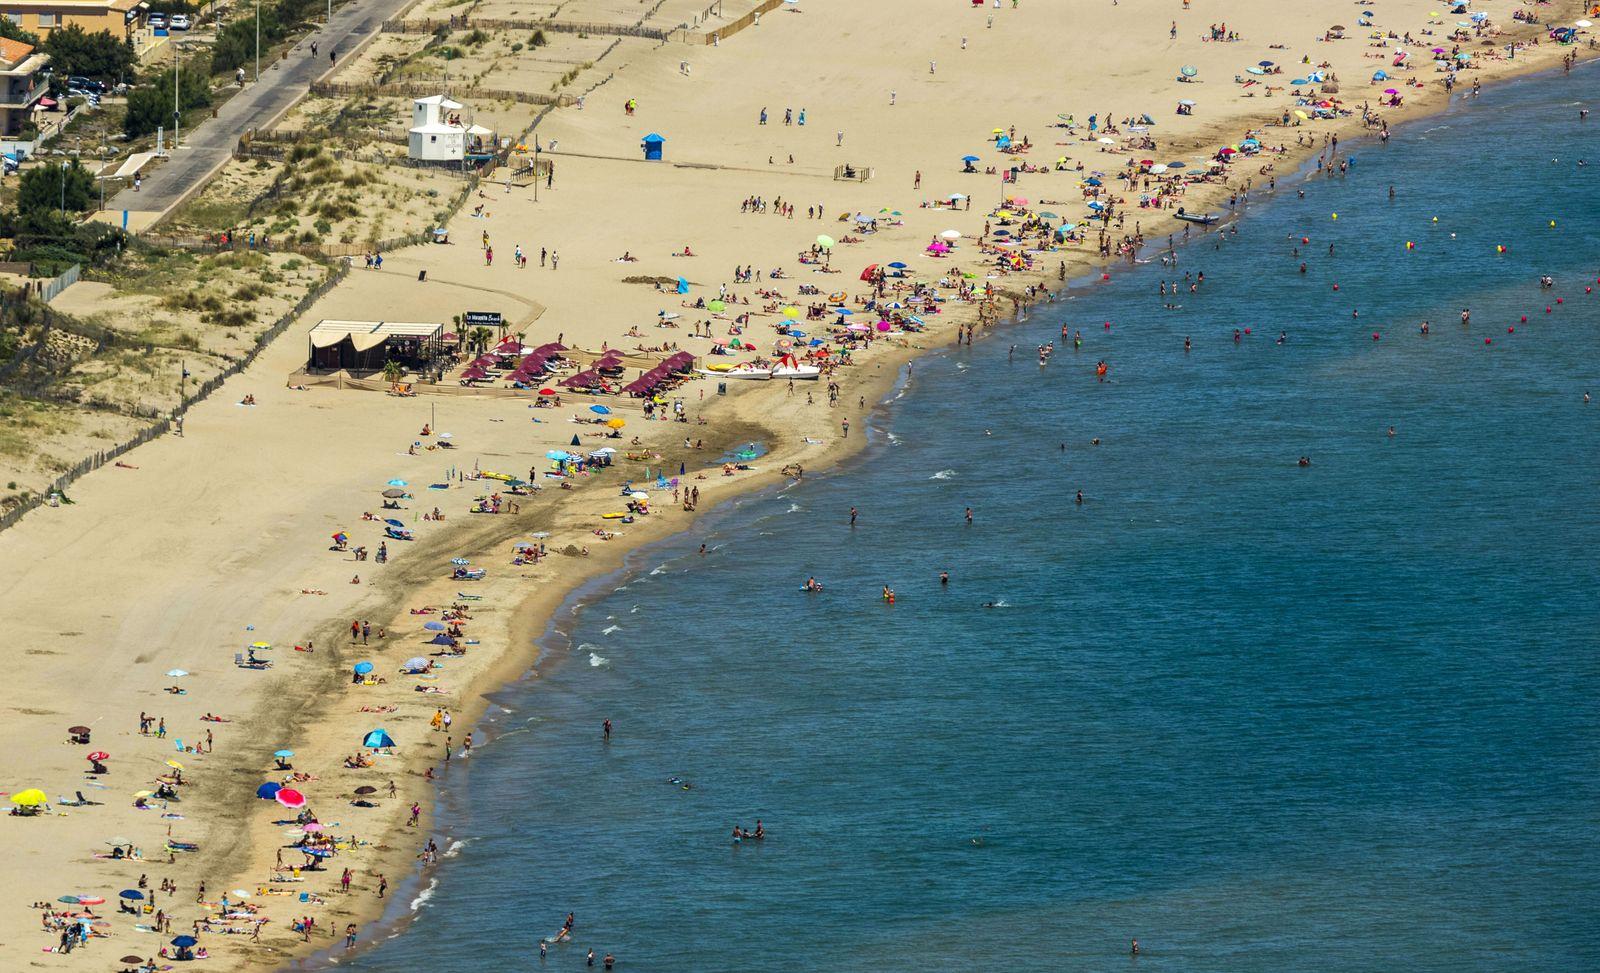 Strand von Cap d Agde Cap d Agde Nude Resort FKK Ferienanlage in Cap d agde Marseillan France L